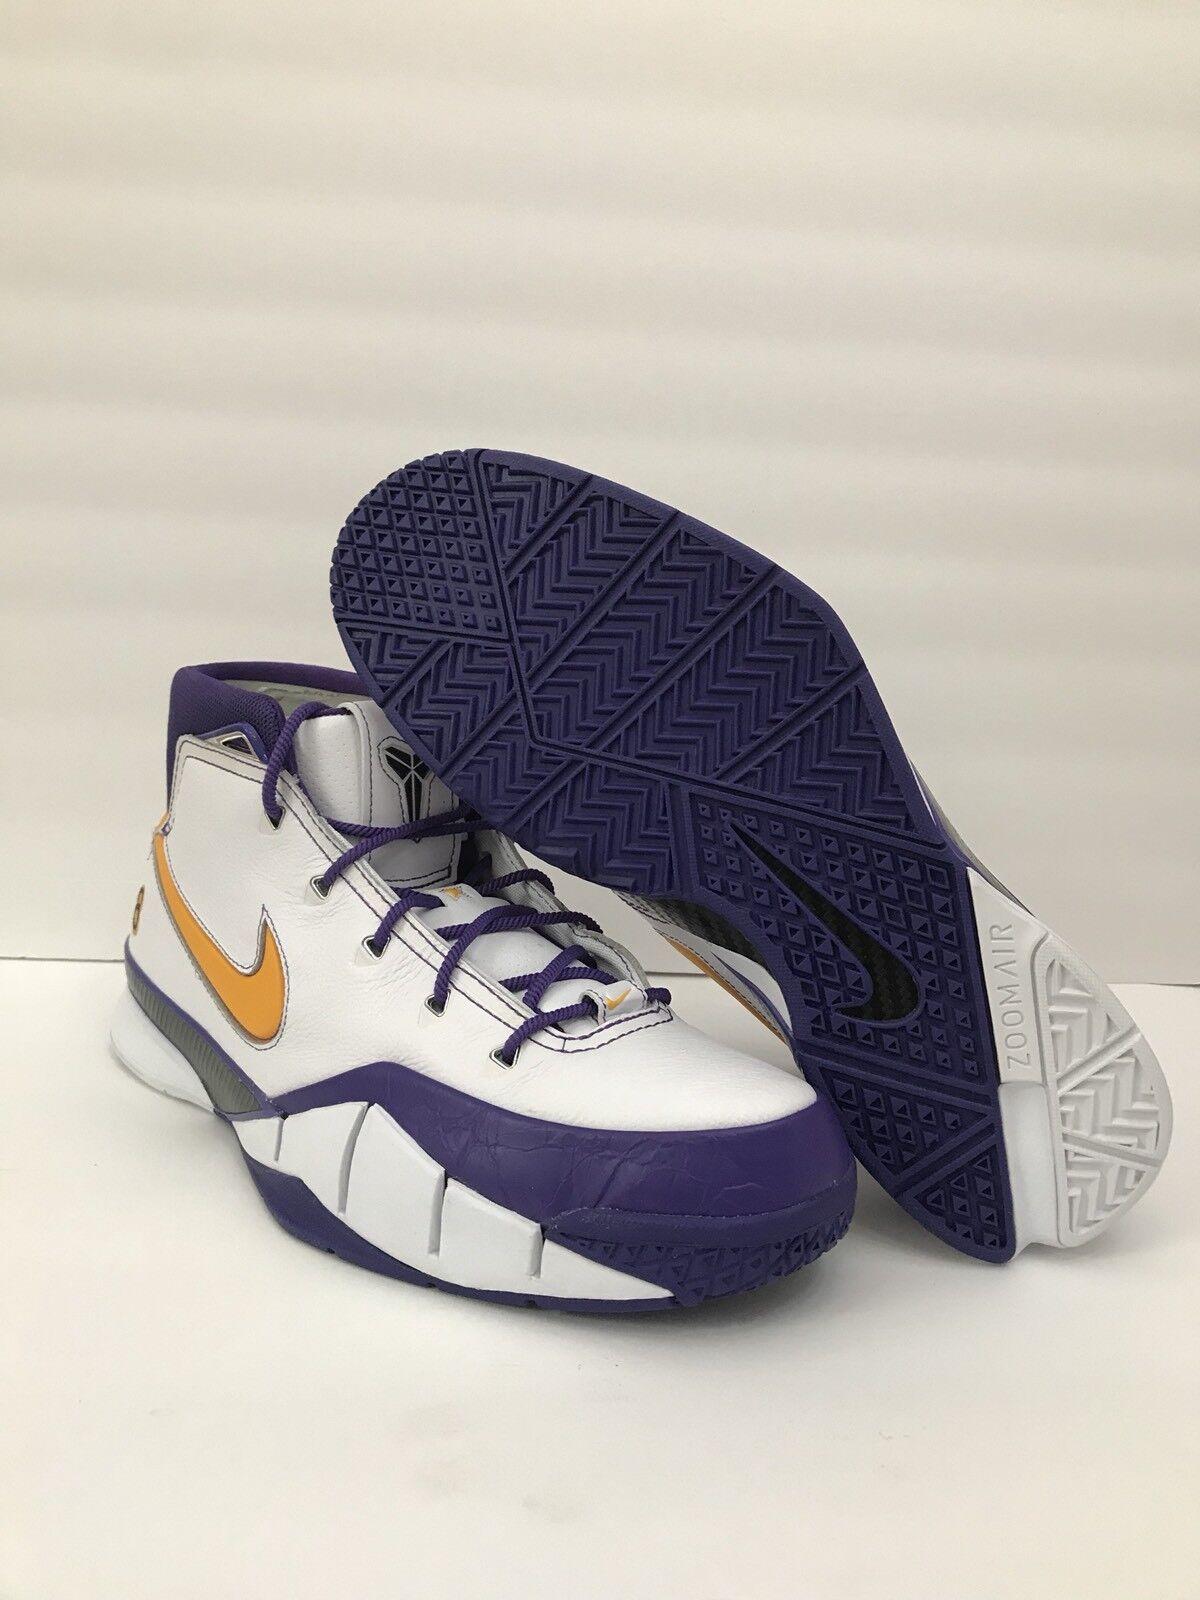 Nike kobe 1 protro glaube 16 schließen letzten sekunden sekunden letzten aq2728-101 mamba sz 12 selten! 54ef8f